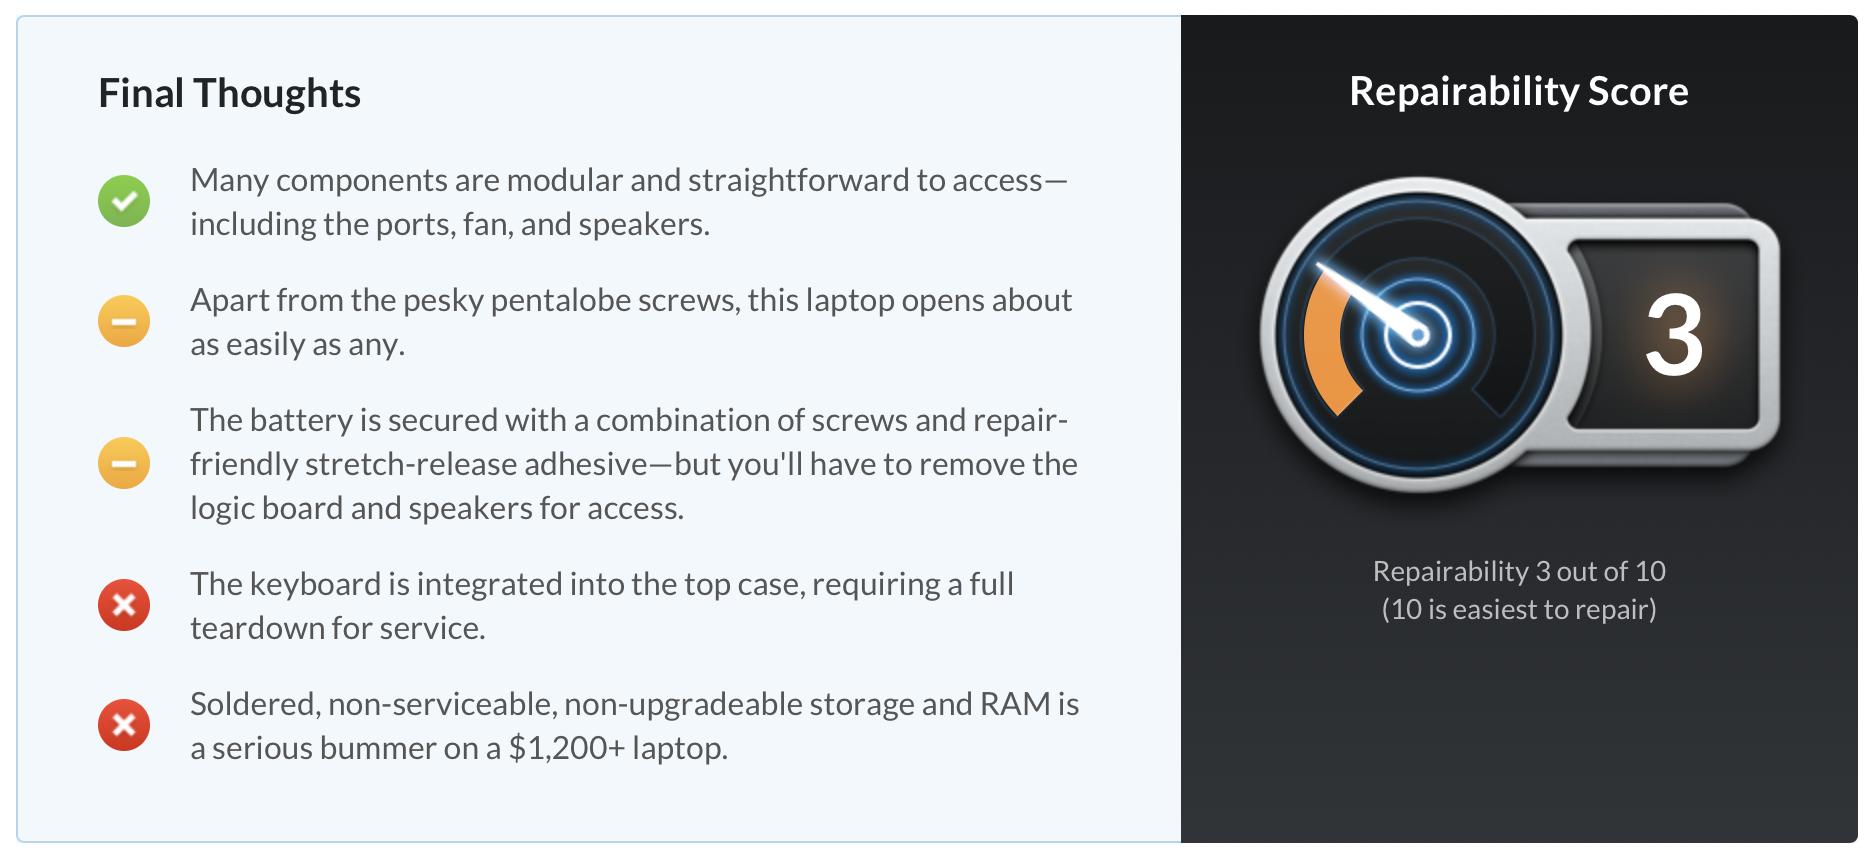 https://www.macfreak.nl/modules/news/images/zArt.iFixitRepairabilityScoreMacBookAir2018.png